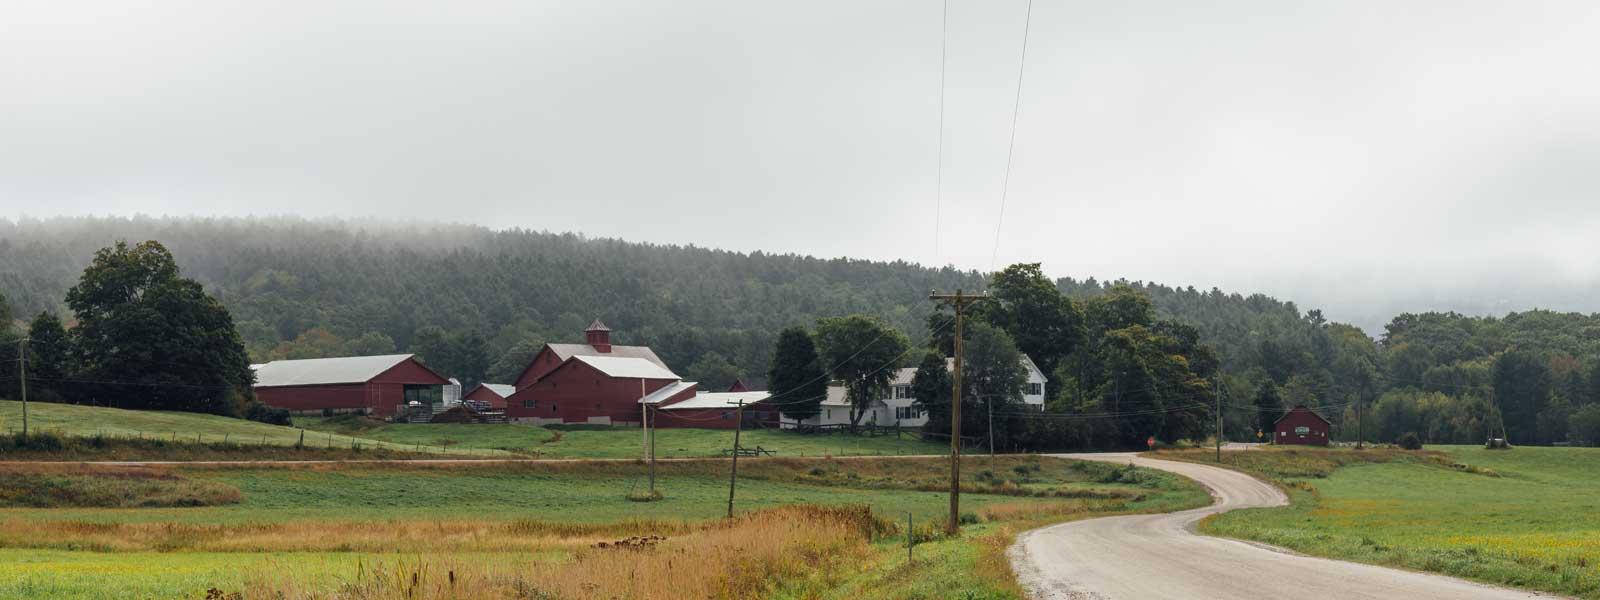 Sanctuary Dairy Farm